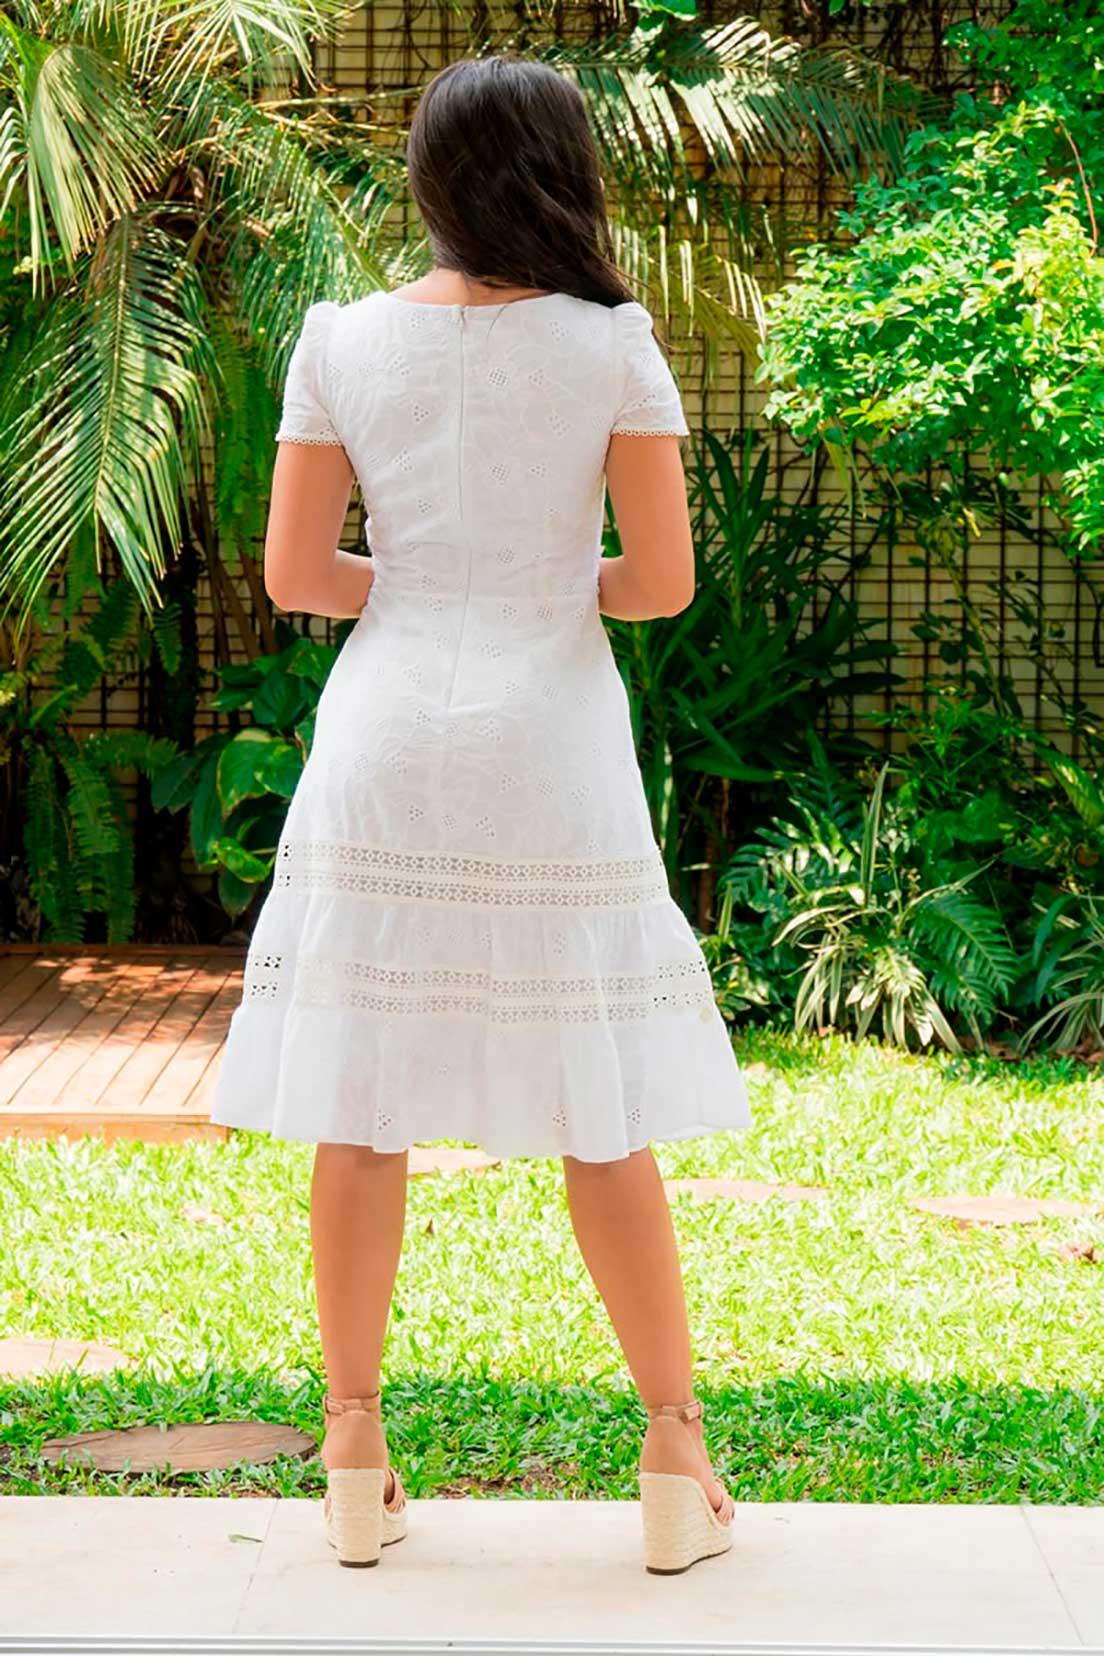 Vestido Laise Detalhes Renda Luciana Pais 92890 Branco